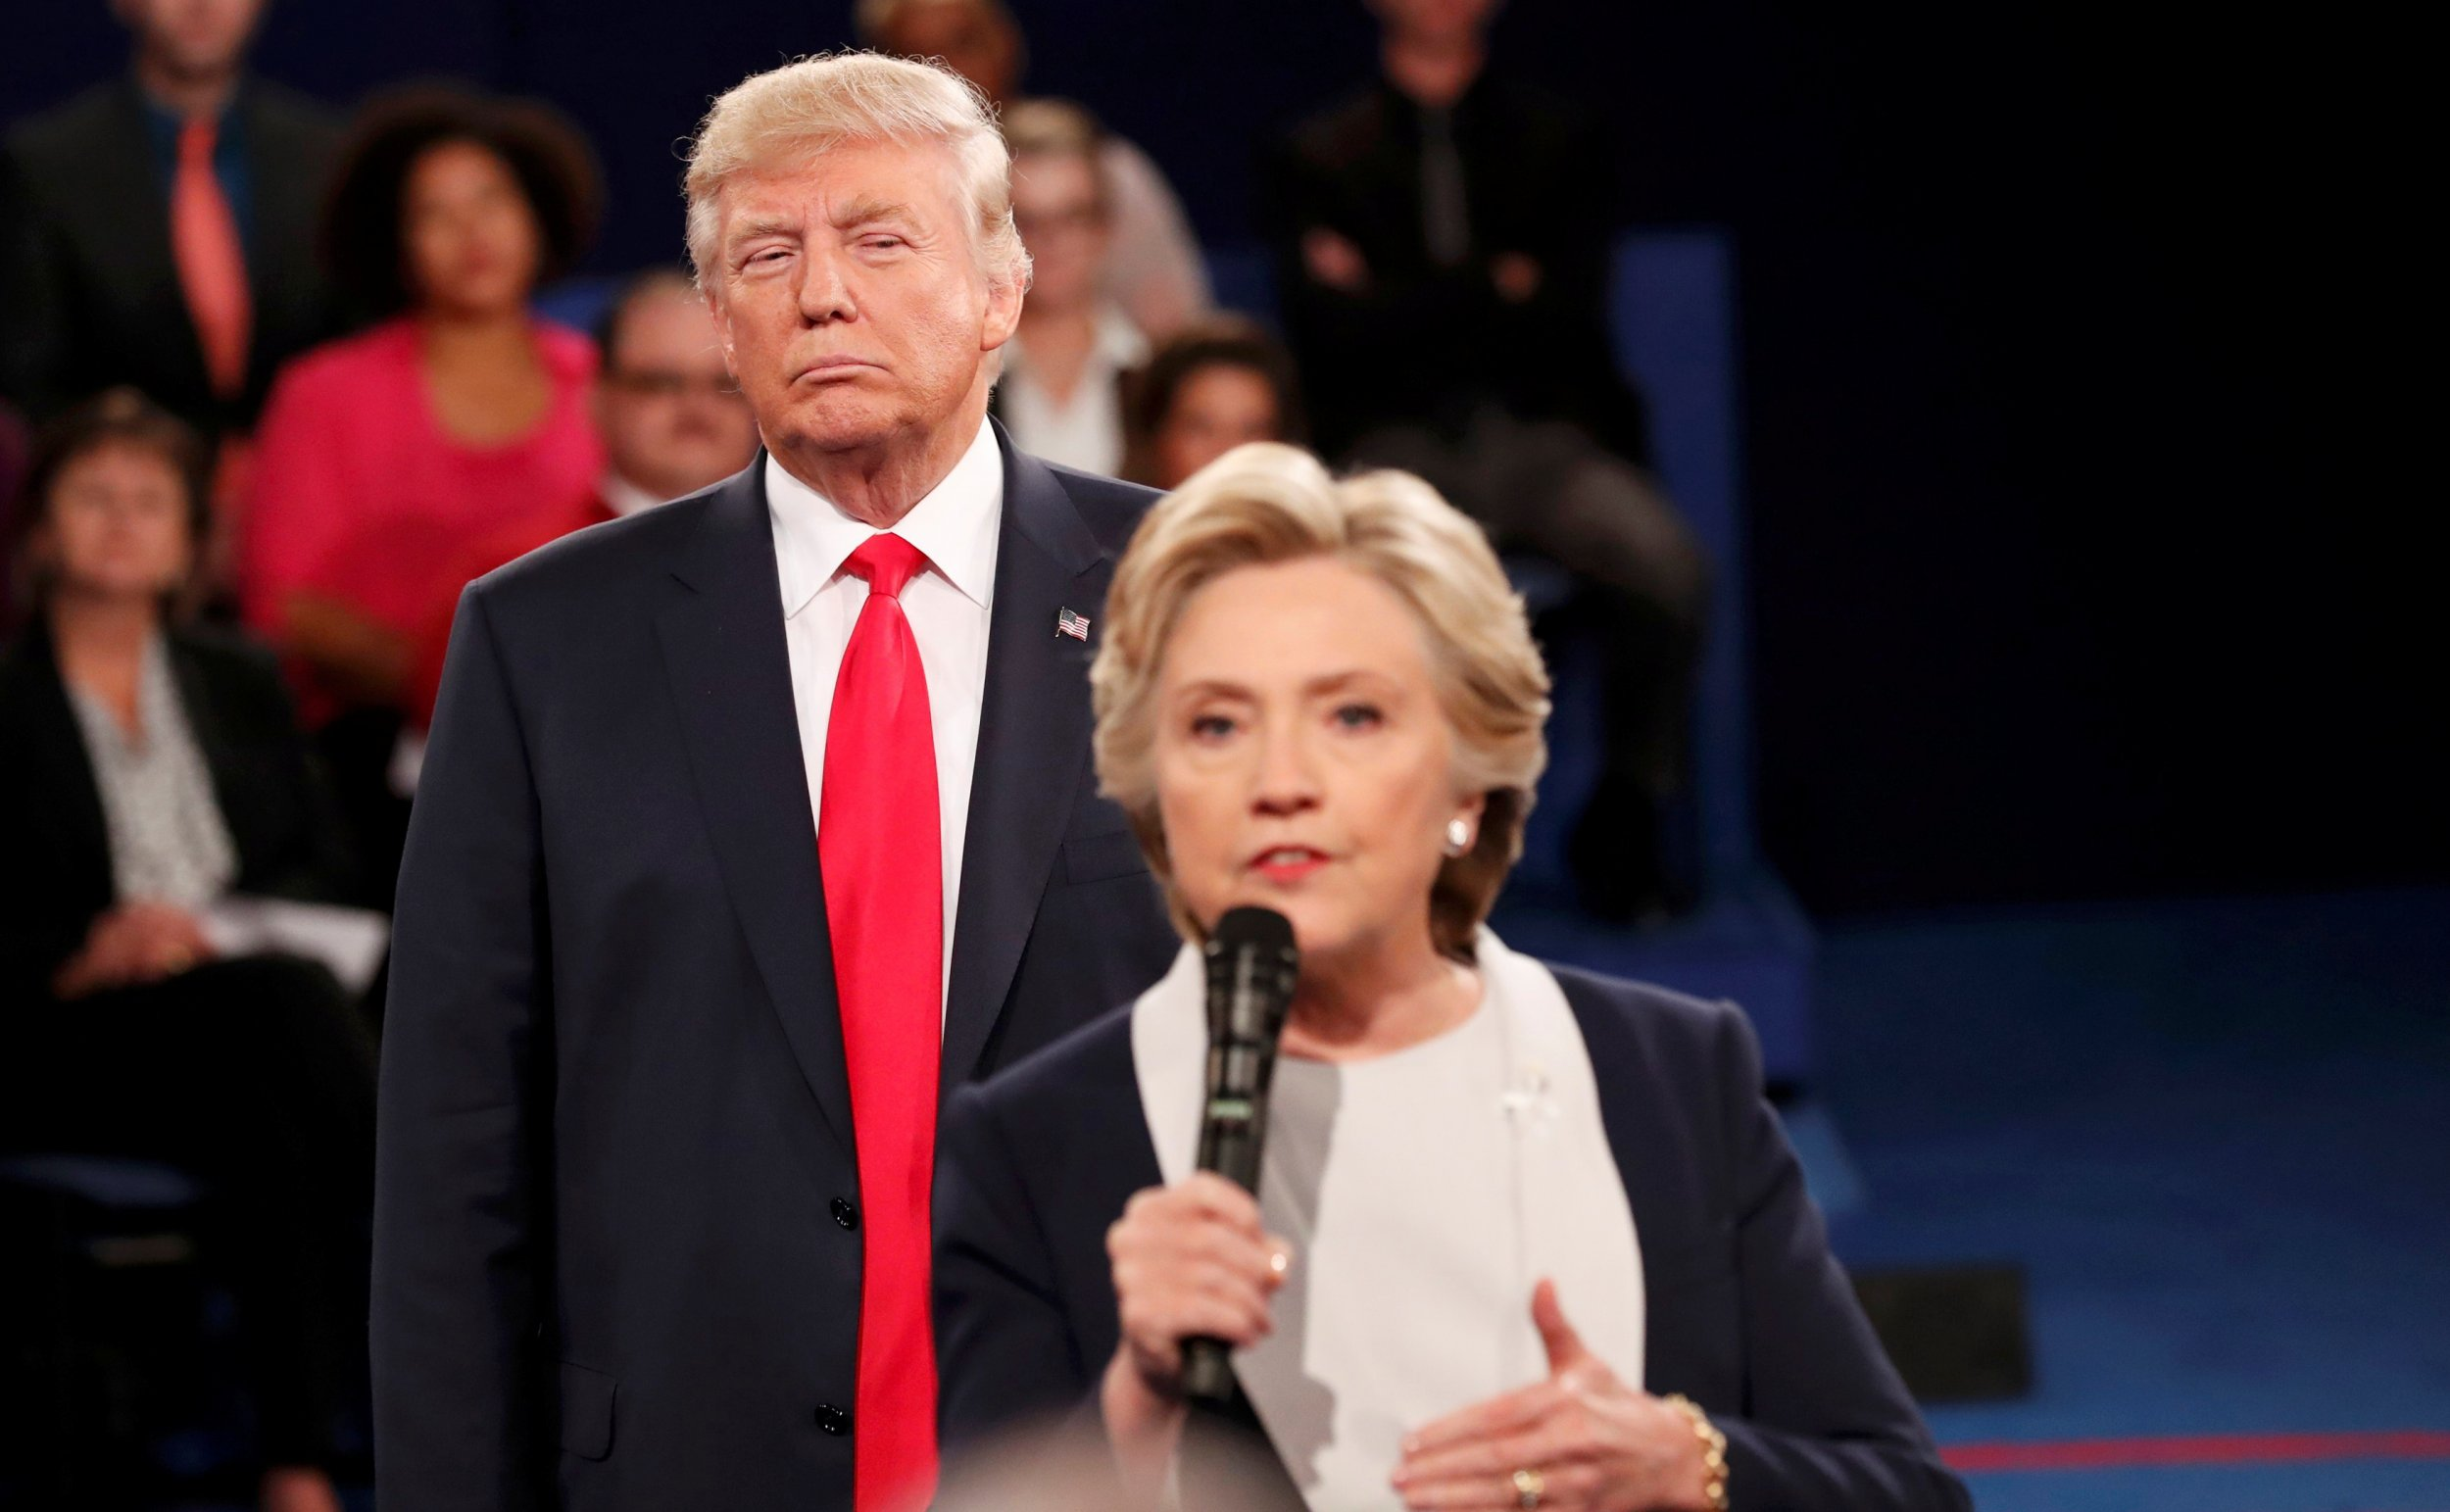 Trump Clinton St Louis debate